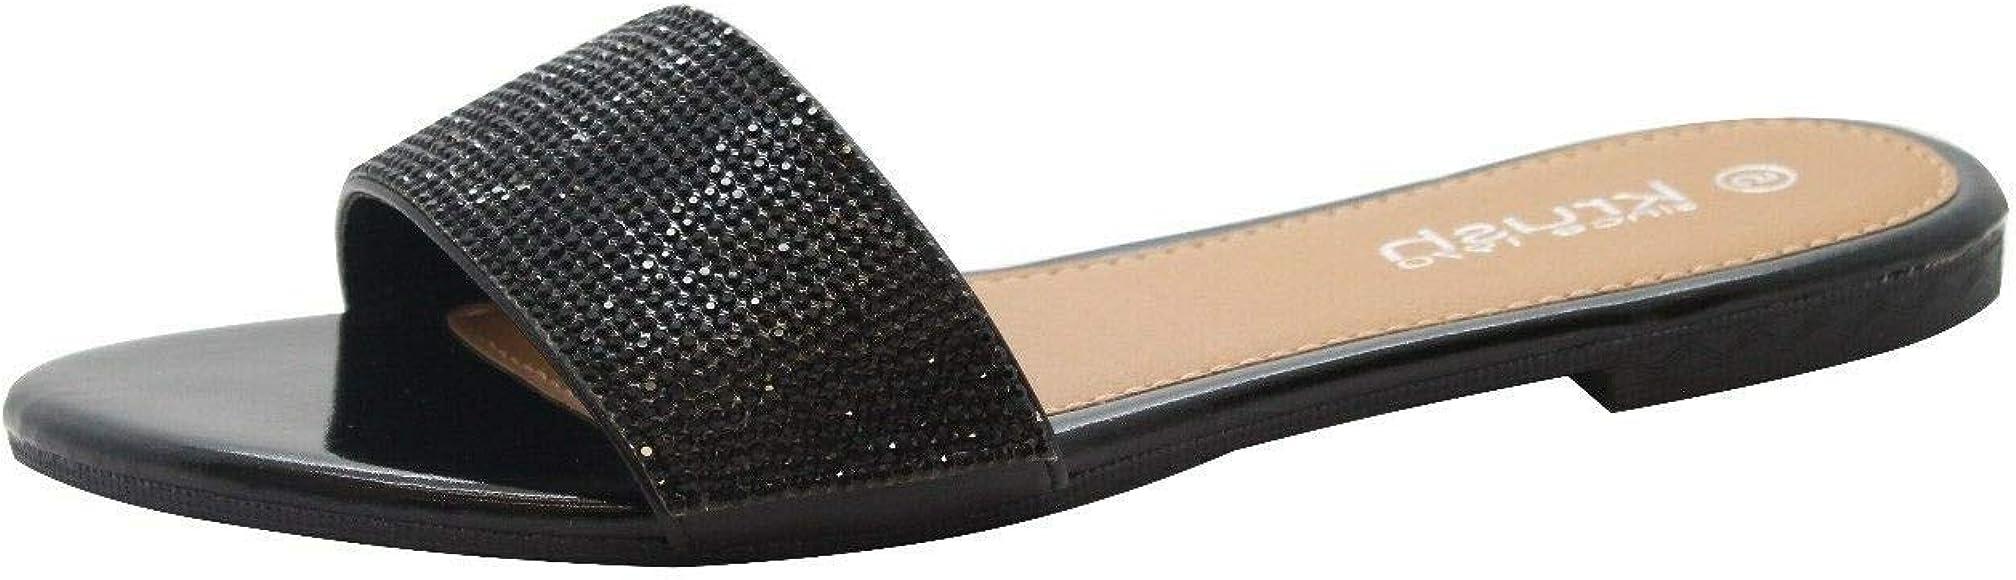 Ladies Womens New Slip On Fur Beach Mule Flat Sliders Sandals Shoes Size 3-8